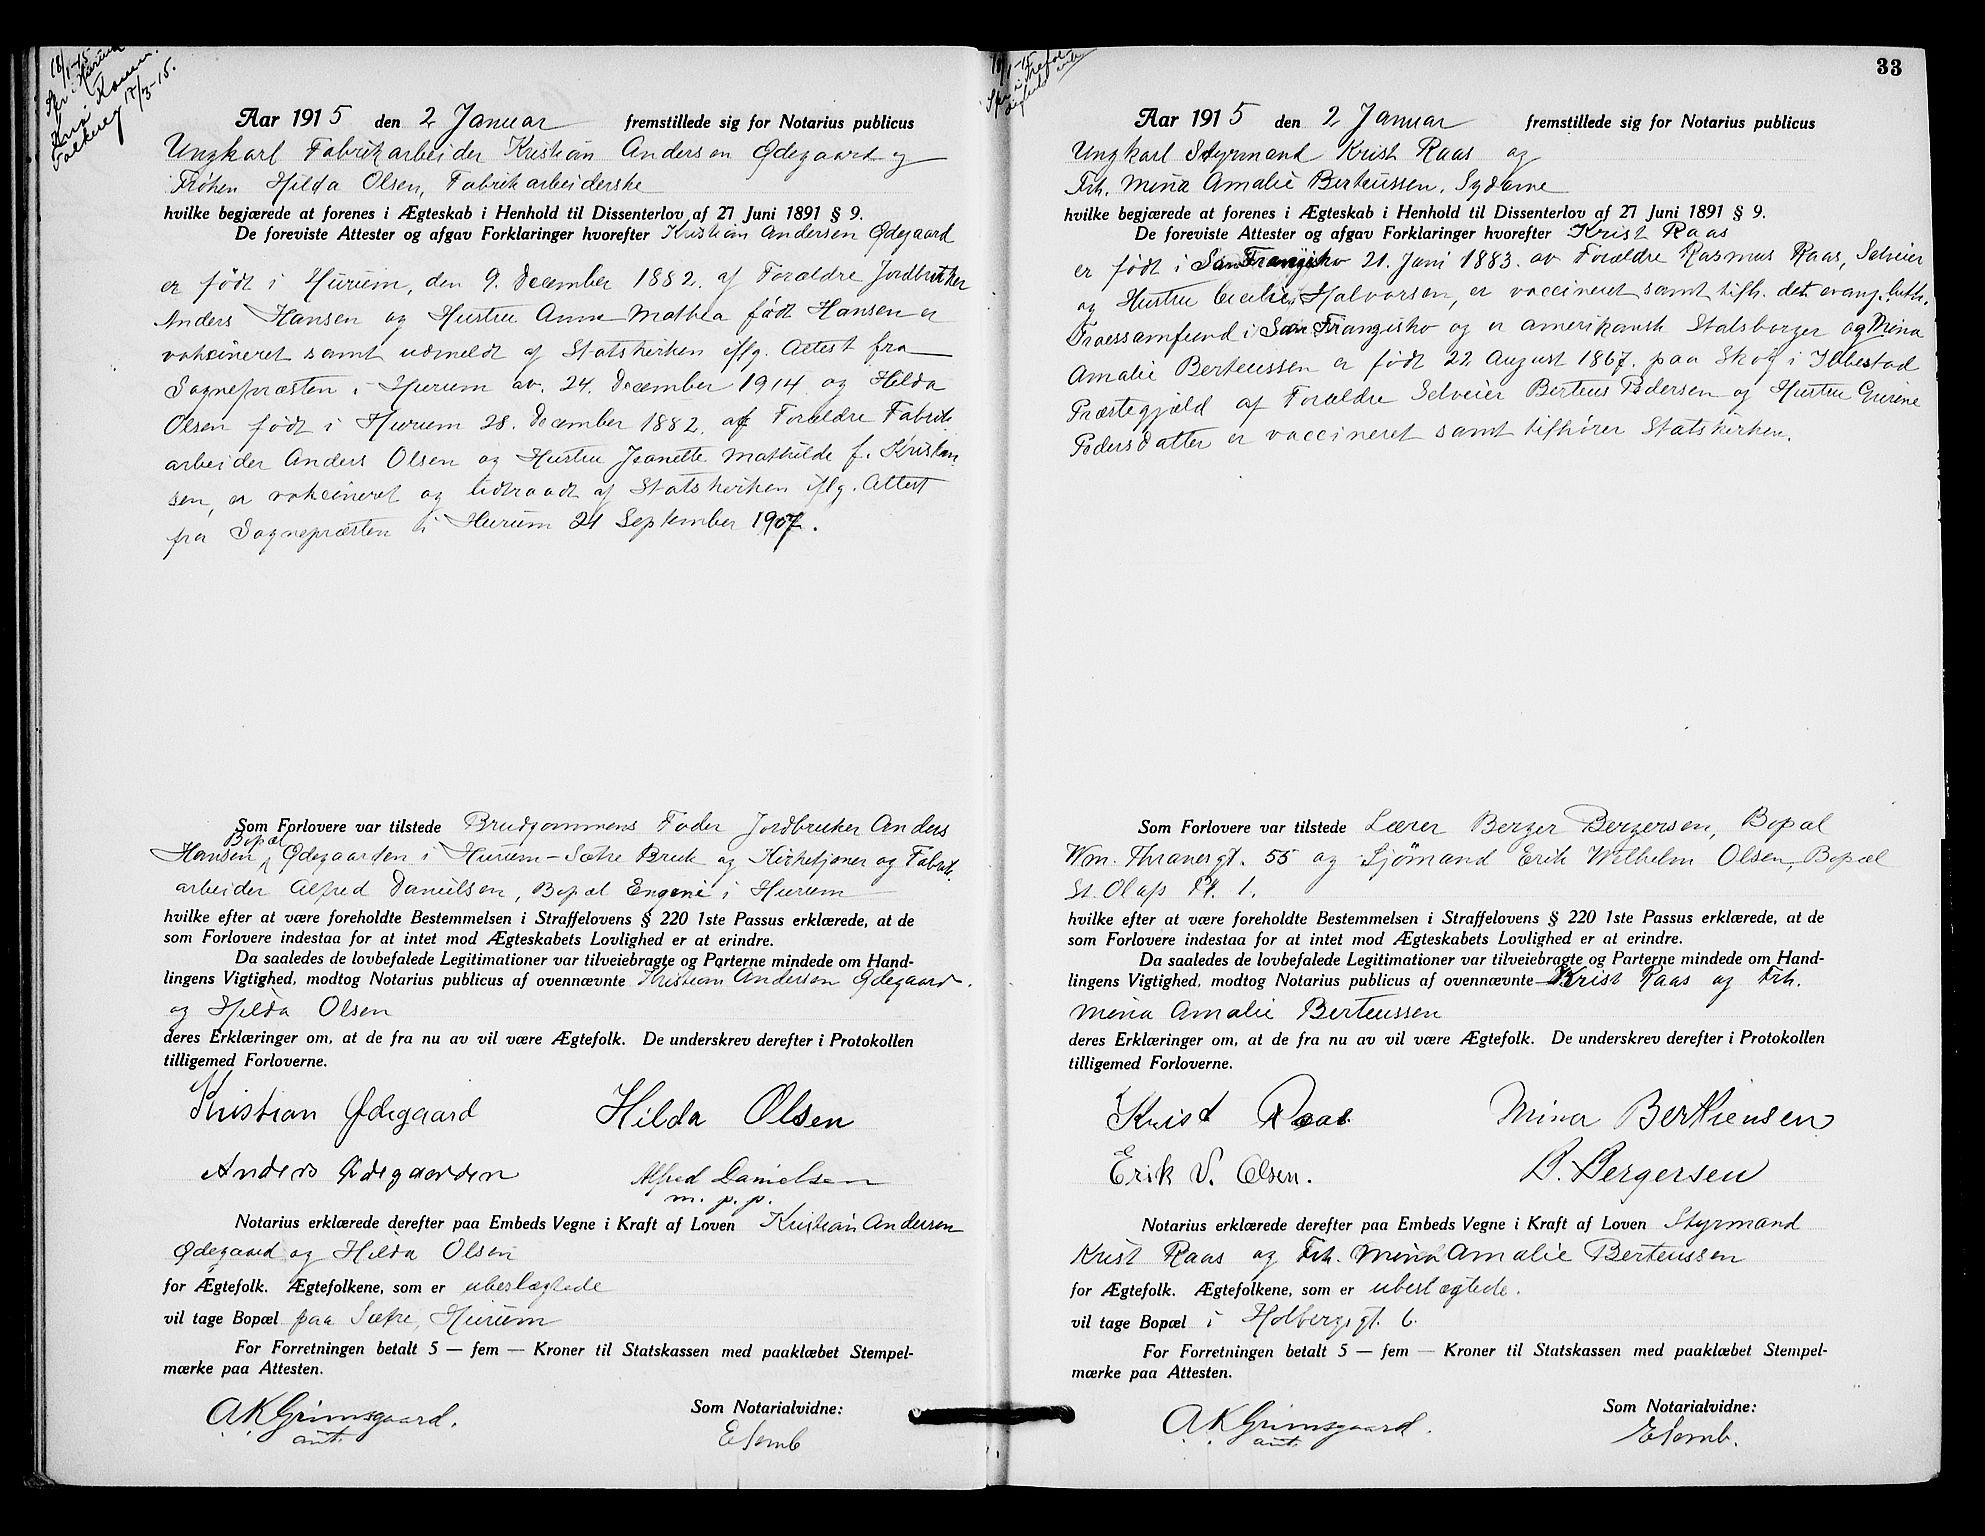 SAO, Oslo byfogd avd. I, L/Lb/Lbb/L0010: Notarialprotokoll, rekke II: Vigsler, 1914-1916, p. 32b-33a